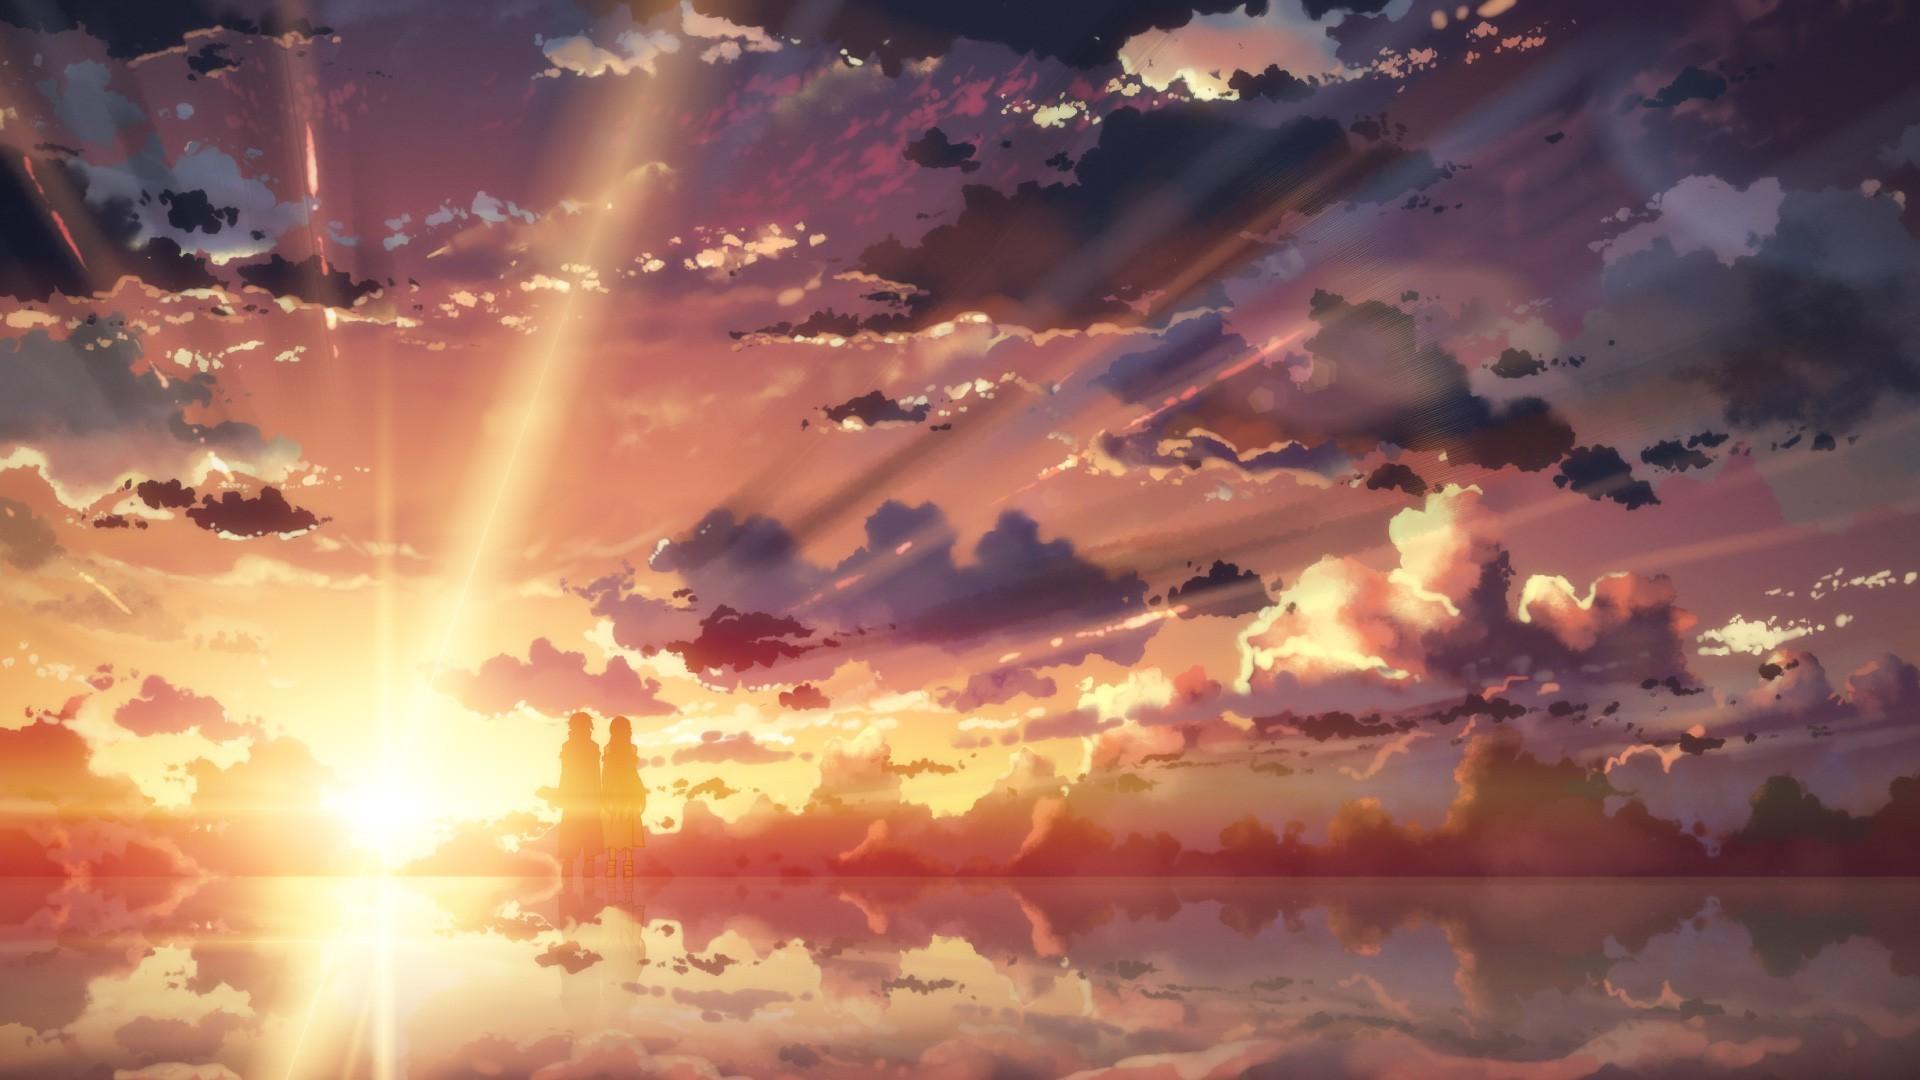 Sword Art Online Wallpaper 3D (68+ images)